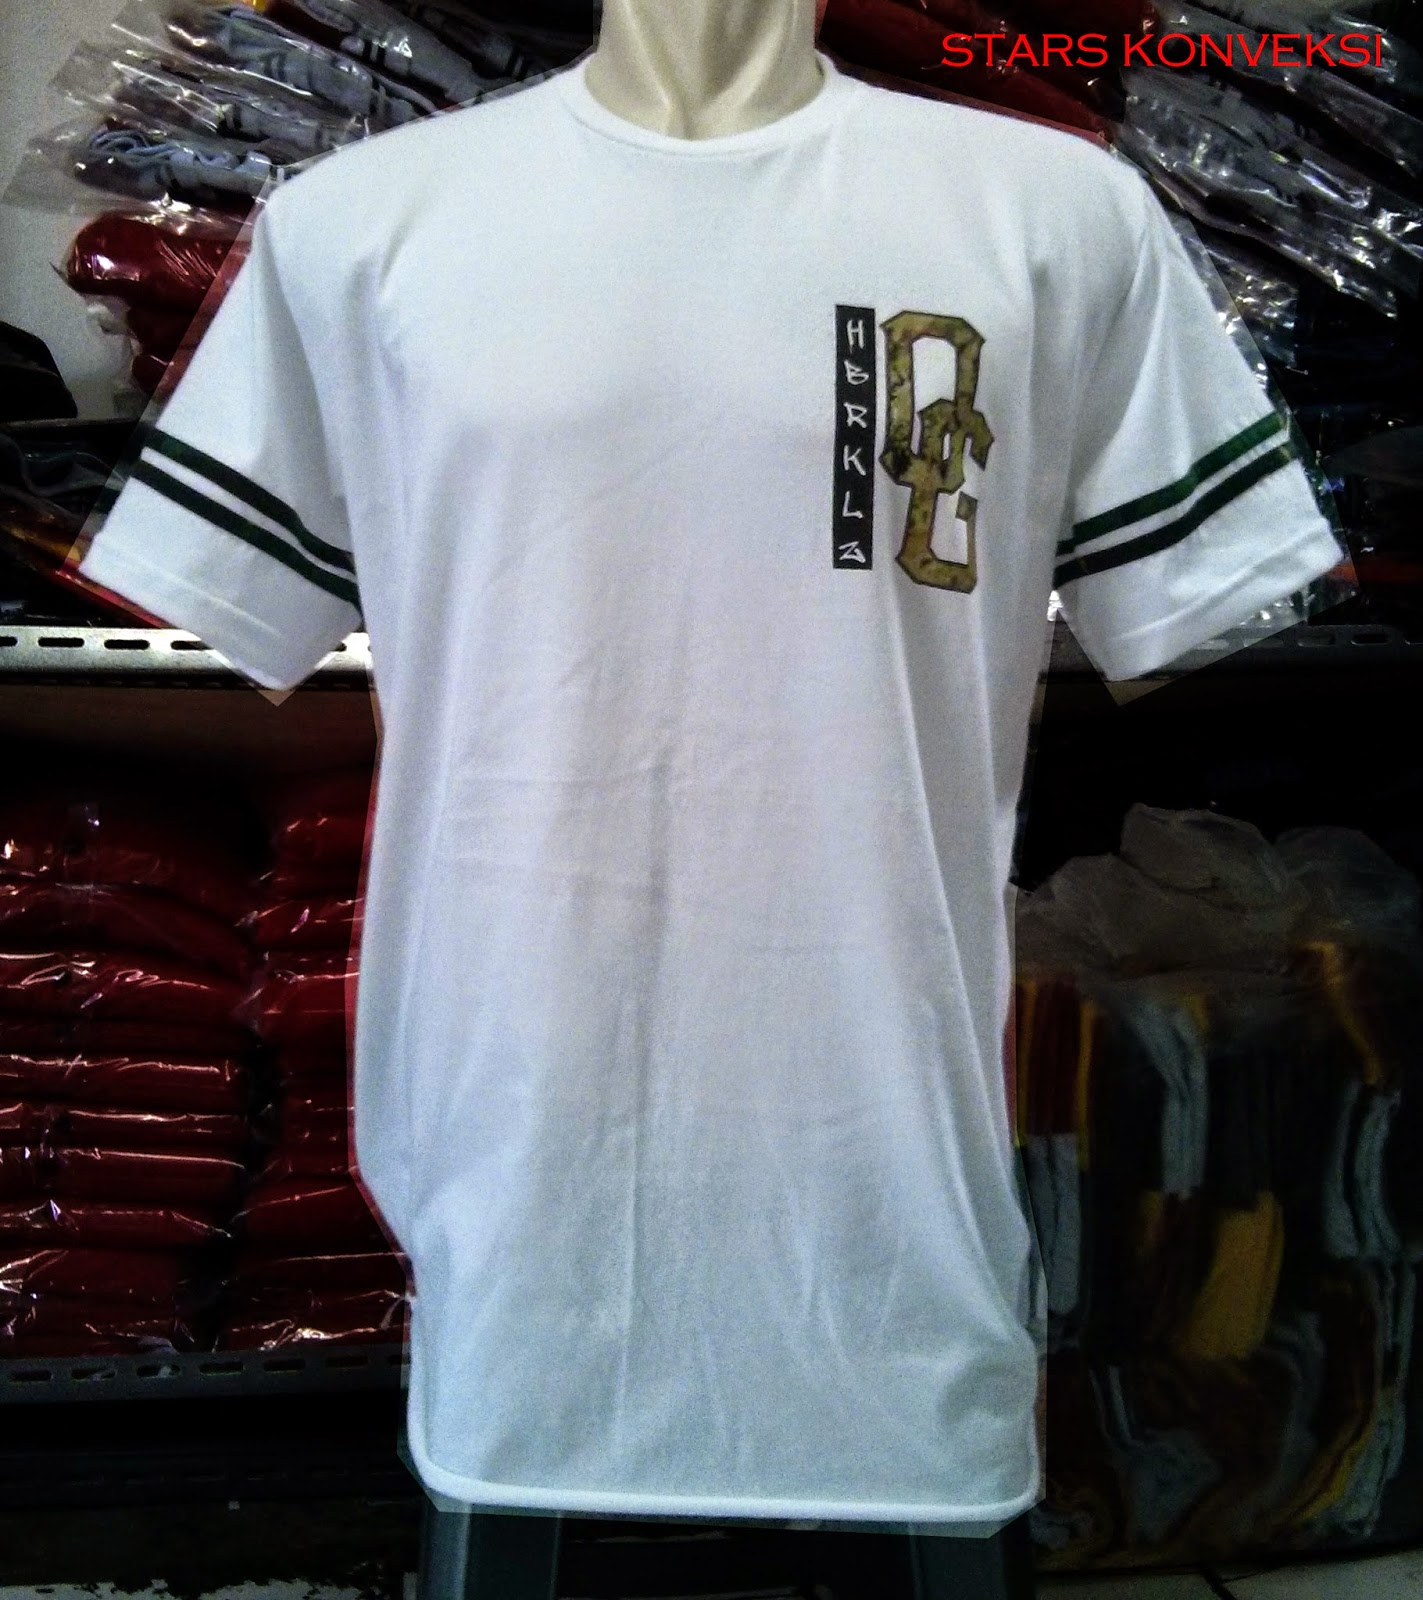 https://i1.wp.com/1.bp.blogspot.com/-zS4zfKVmFag/U57I_h-SUkI/AAAAAAAAAb4/IaoLPlR0Oh8/s1600/t-shirt+distro+vendor+malaysia.jpg?resize=859%2C966&ssl=1